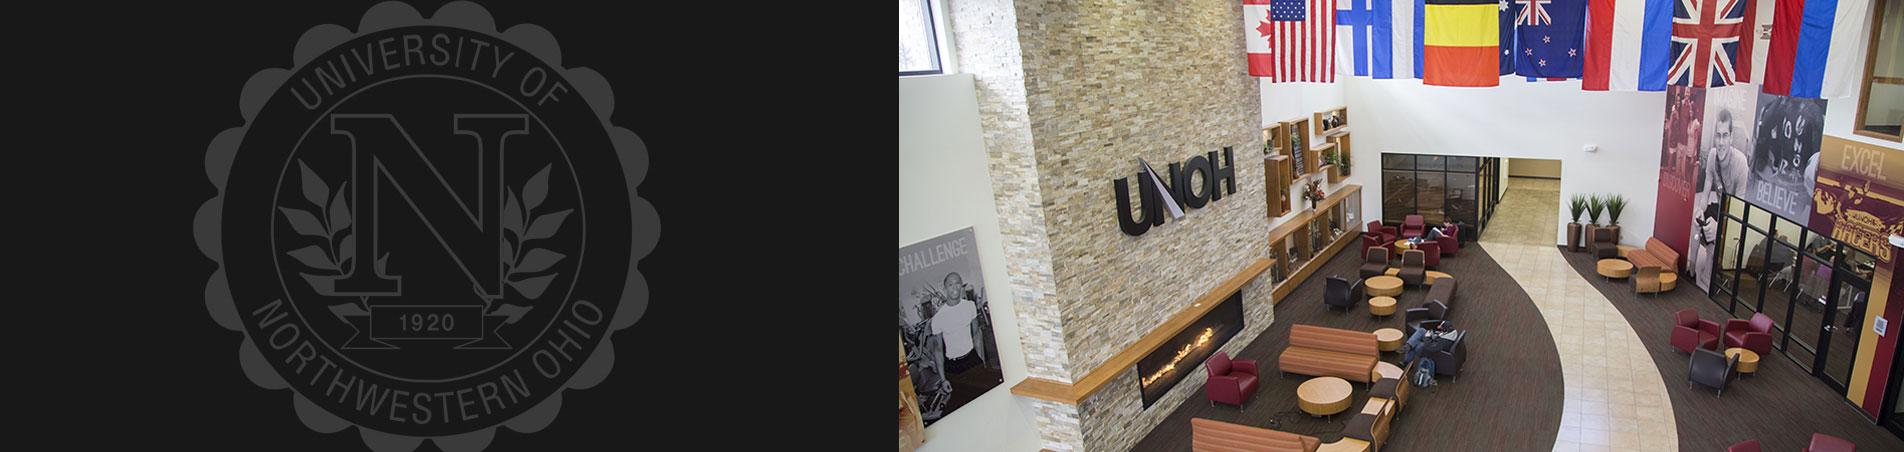 Unoh university of northwestern ohio for Northwestern virtual tour